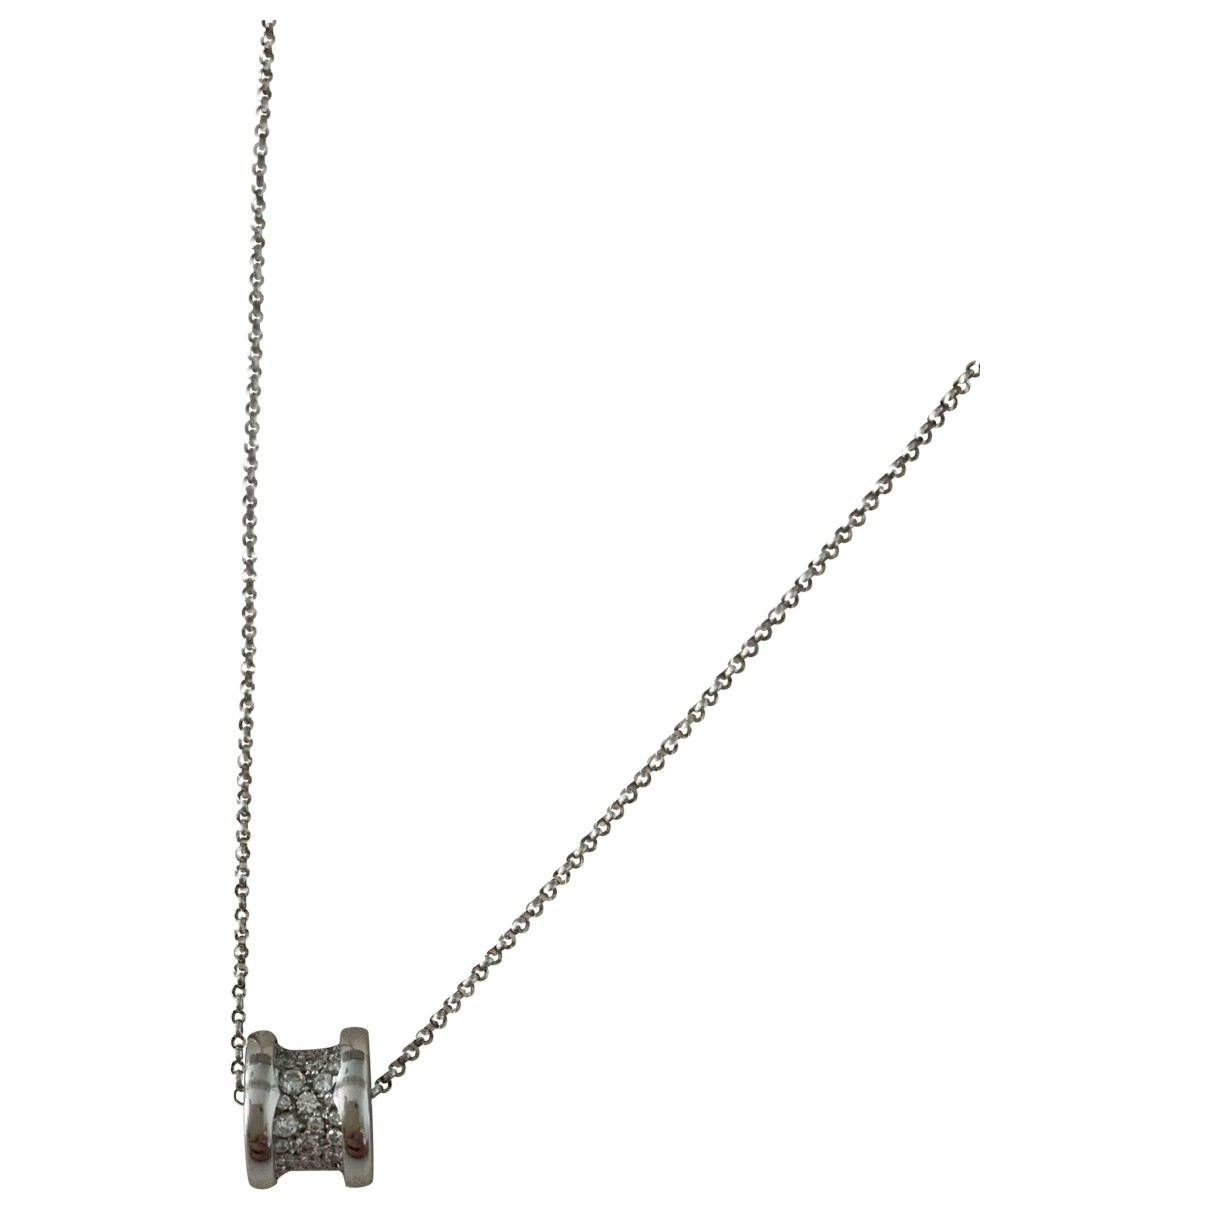 Bvlgari - Collier B.Zero1 pour femme en or blanc - argente